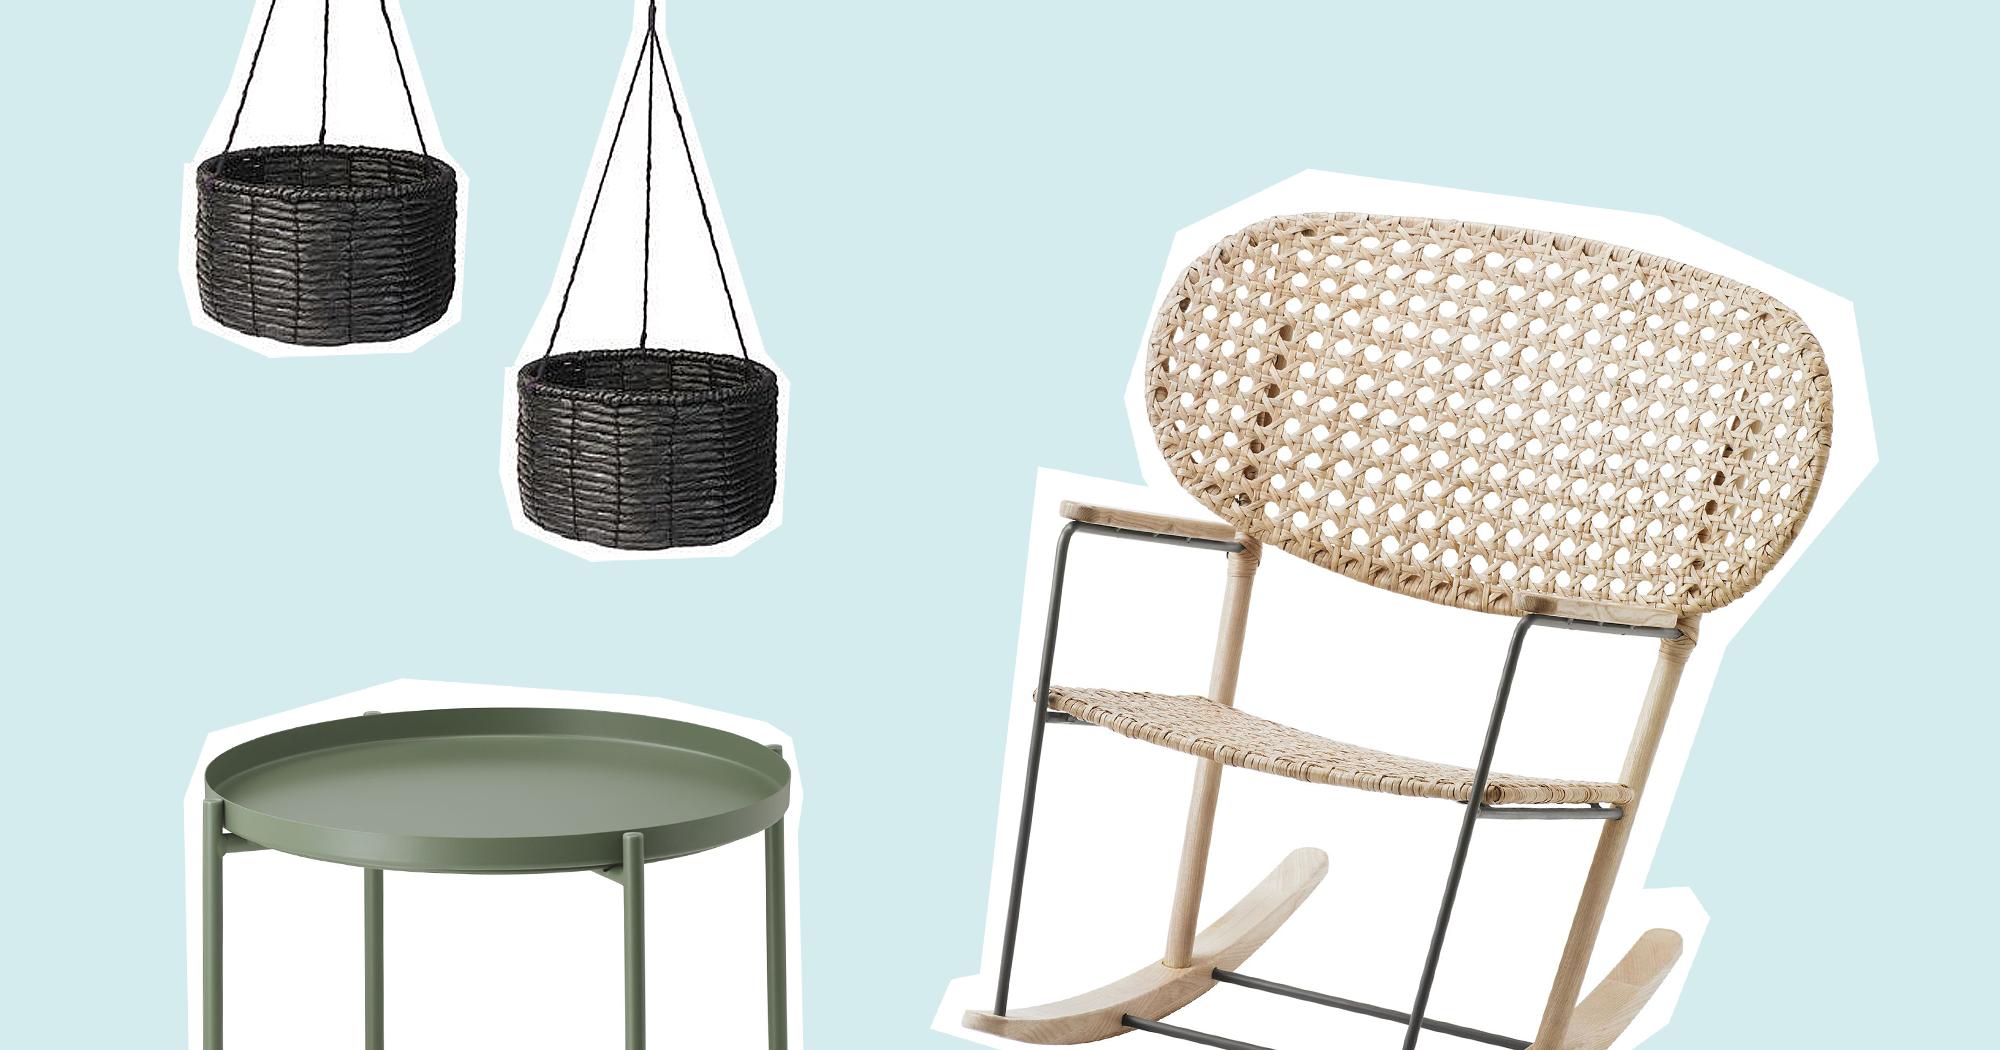 15 bezaubernde ikea artikel aus dem neuen katalog. Black Bedroom Furniture Sets. Home Design Ideas